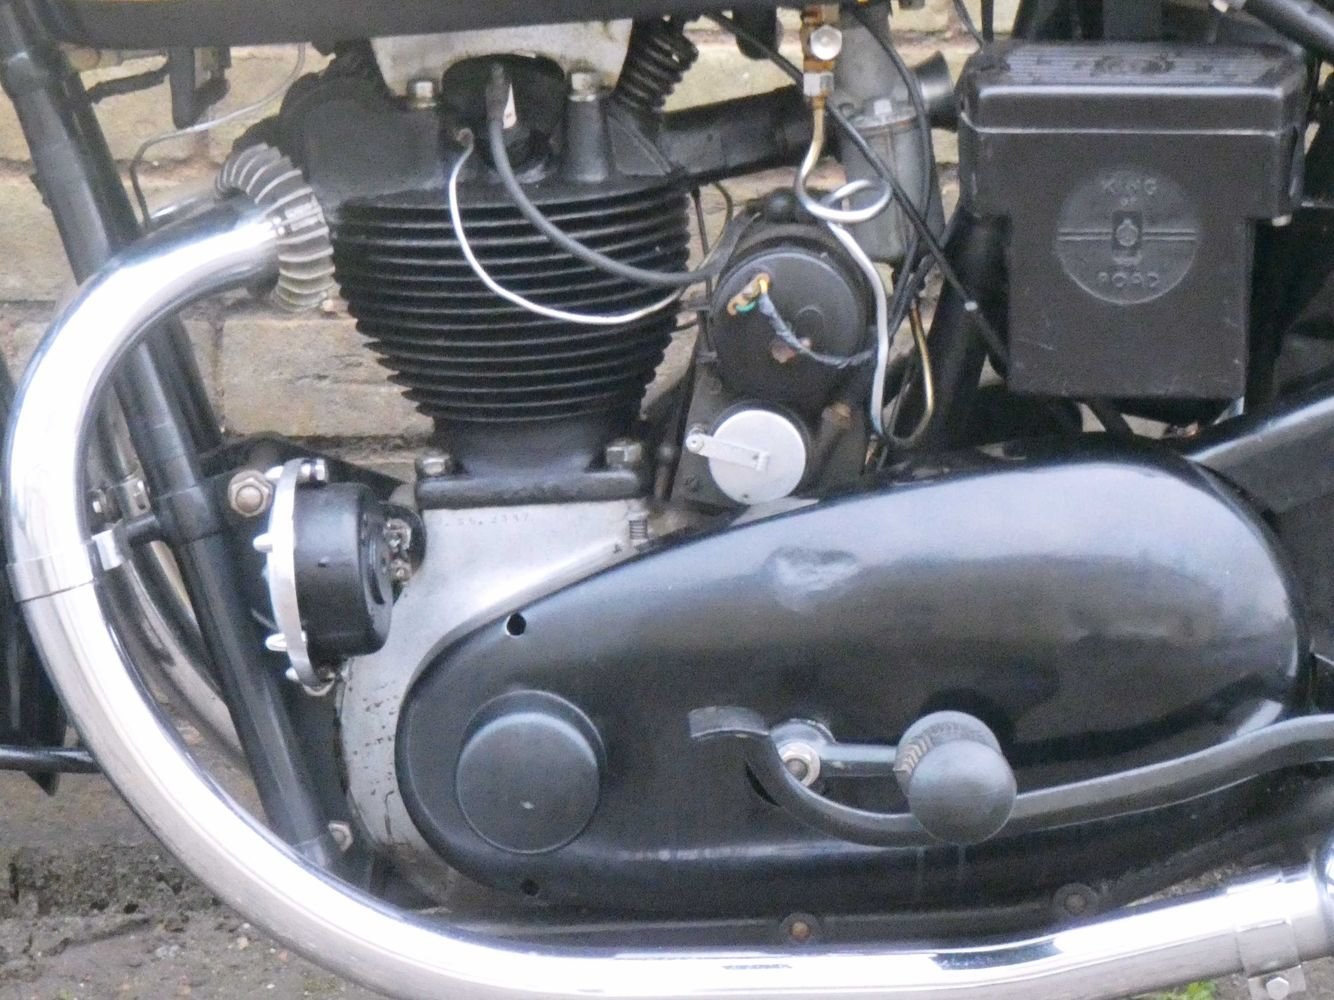 1935 Triumph Model 5/2 500cc For Sale (picture 4 of 6)